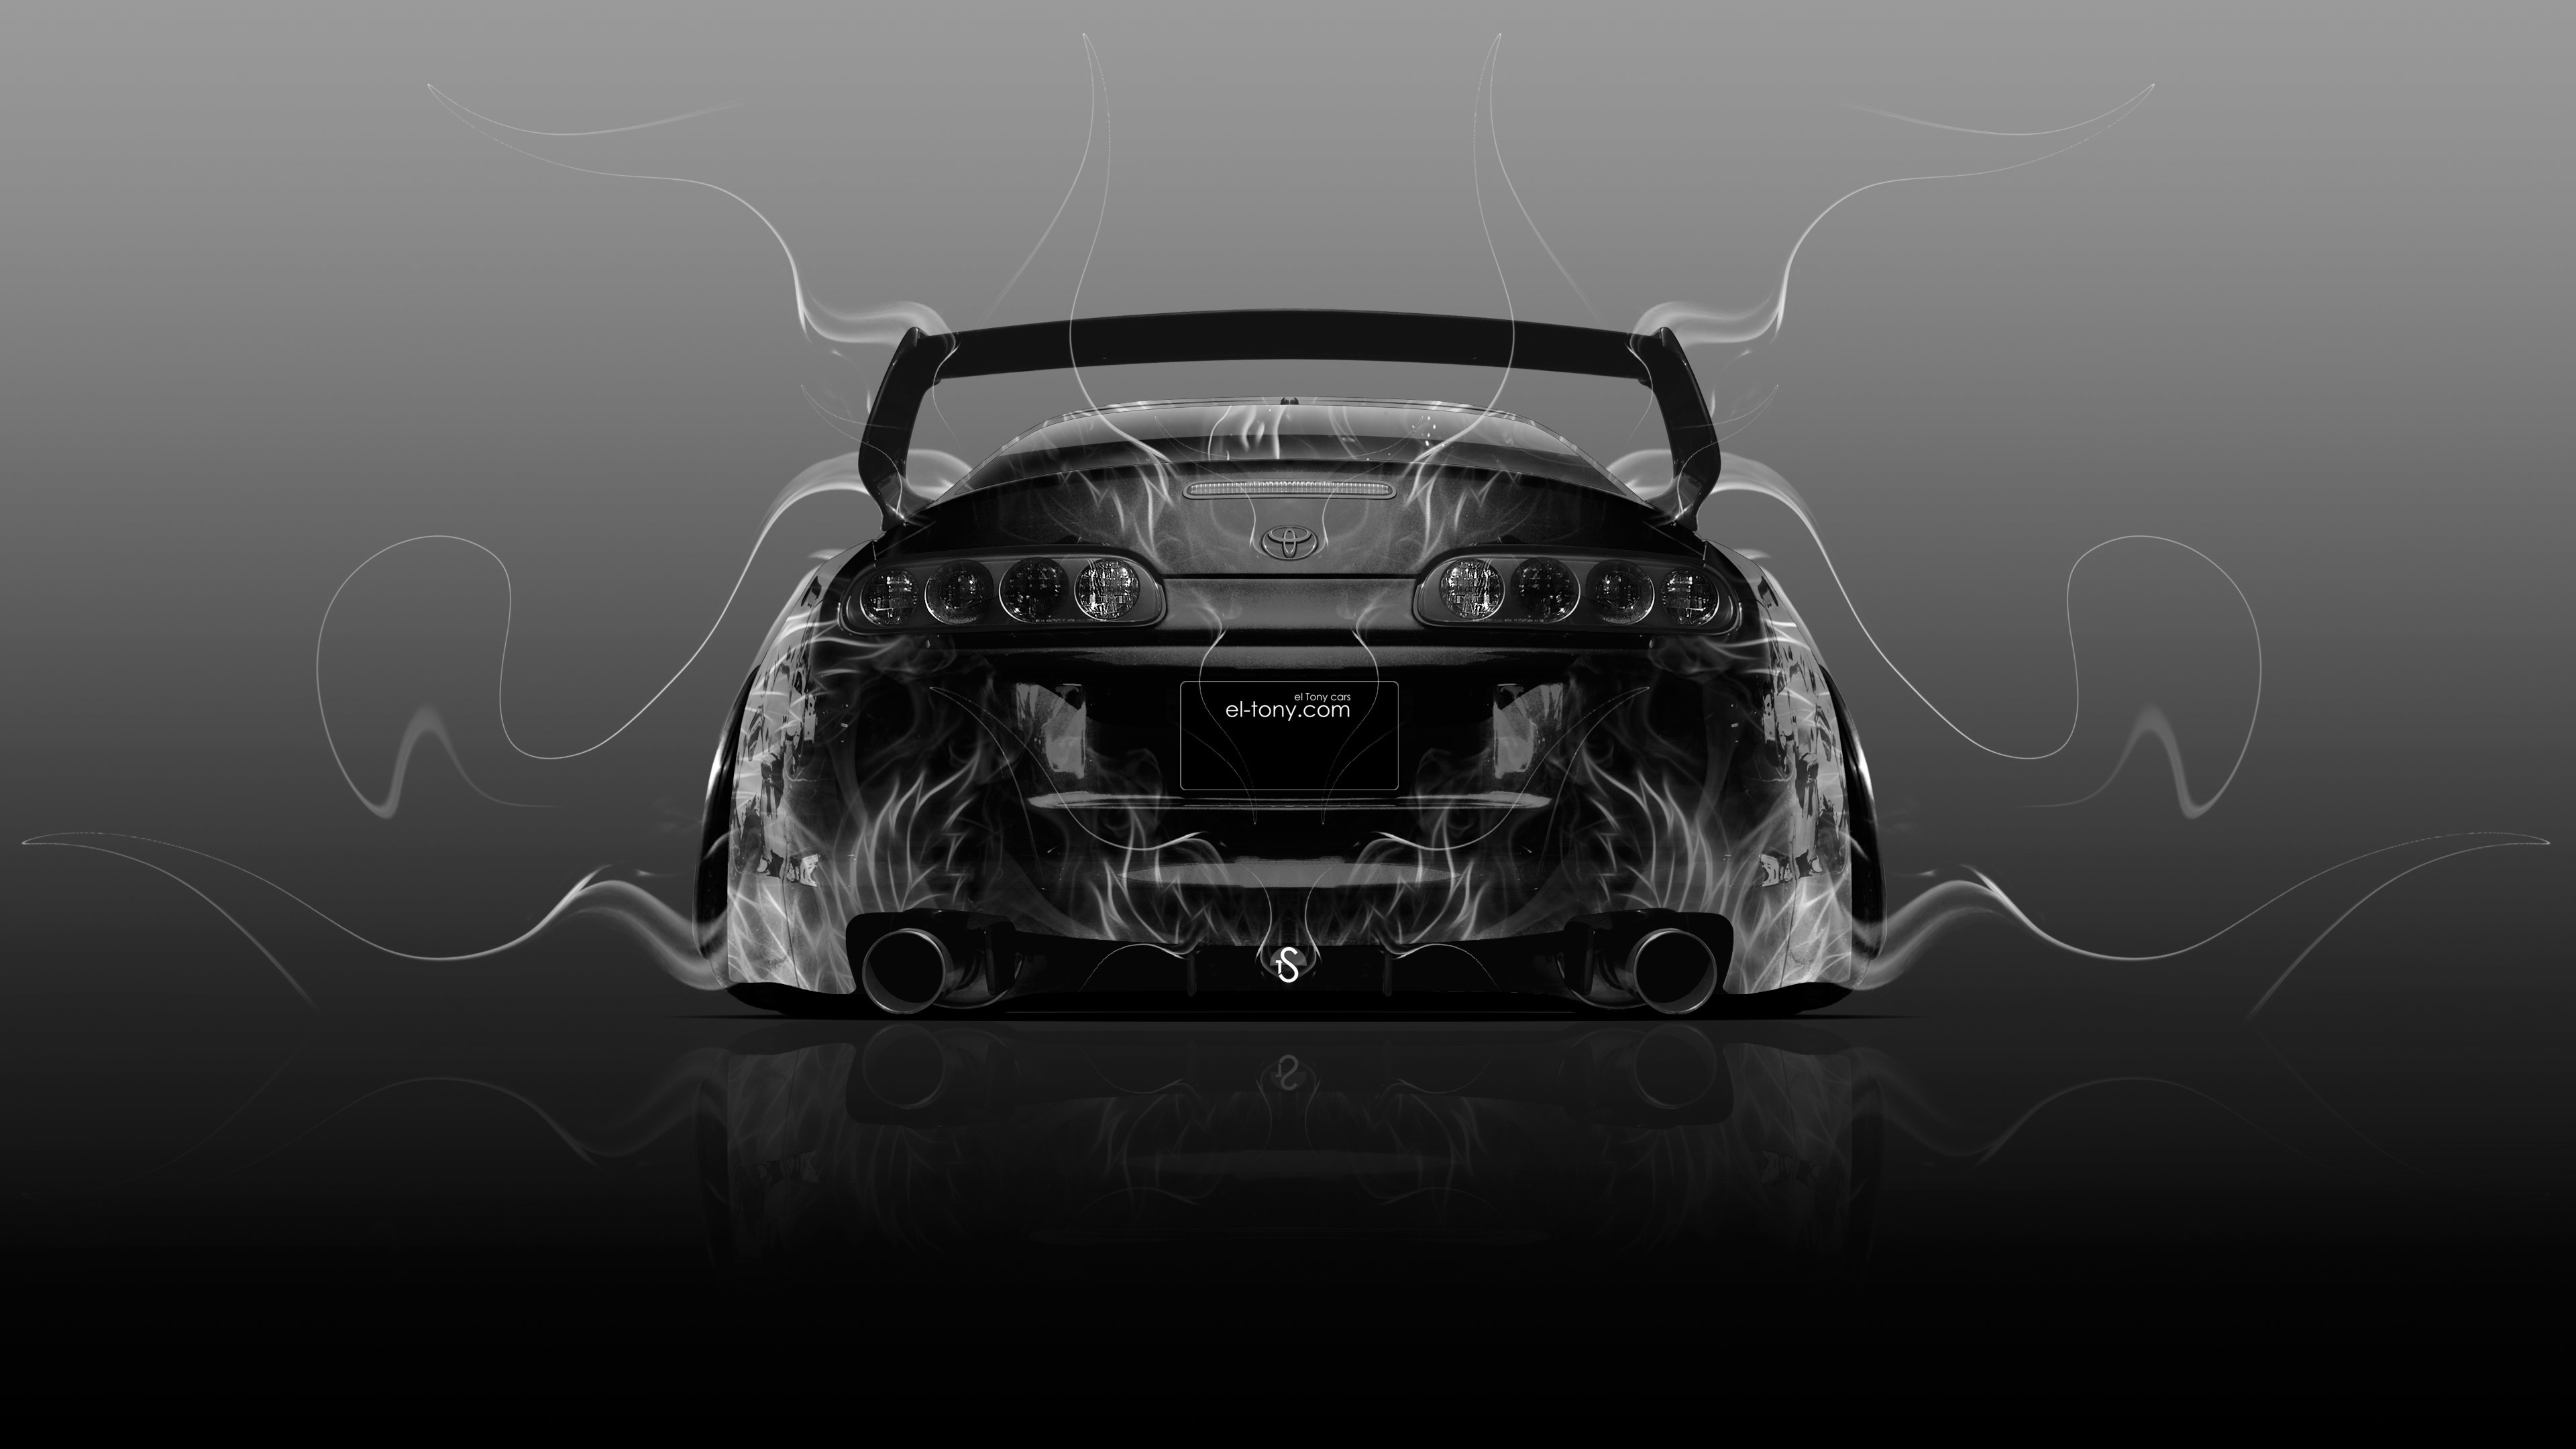 1920x1200 Cars Drag Race Koenigsegg CCX Konigsegg Reflections Toyota Supra  Vehicles